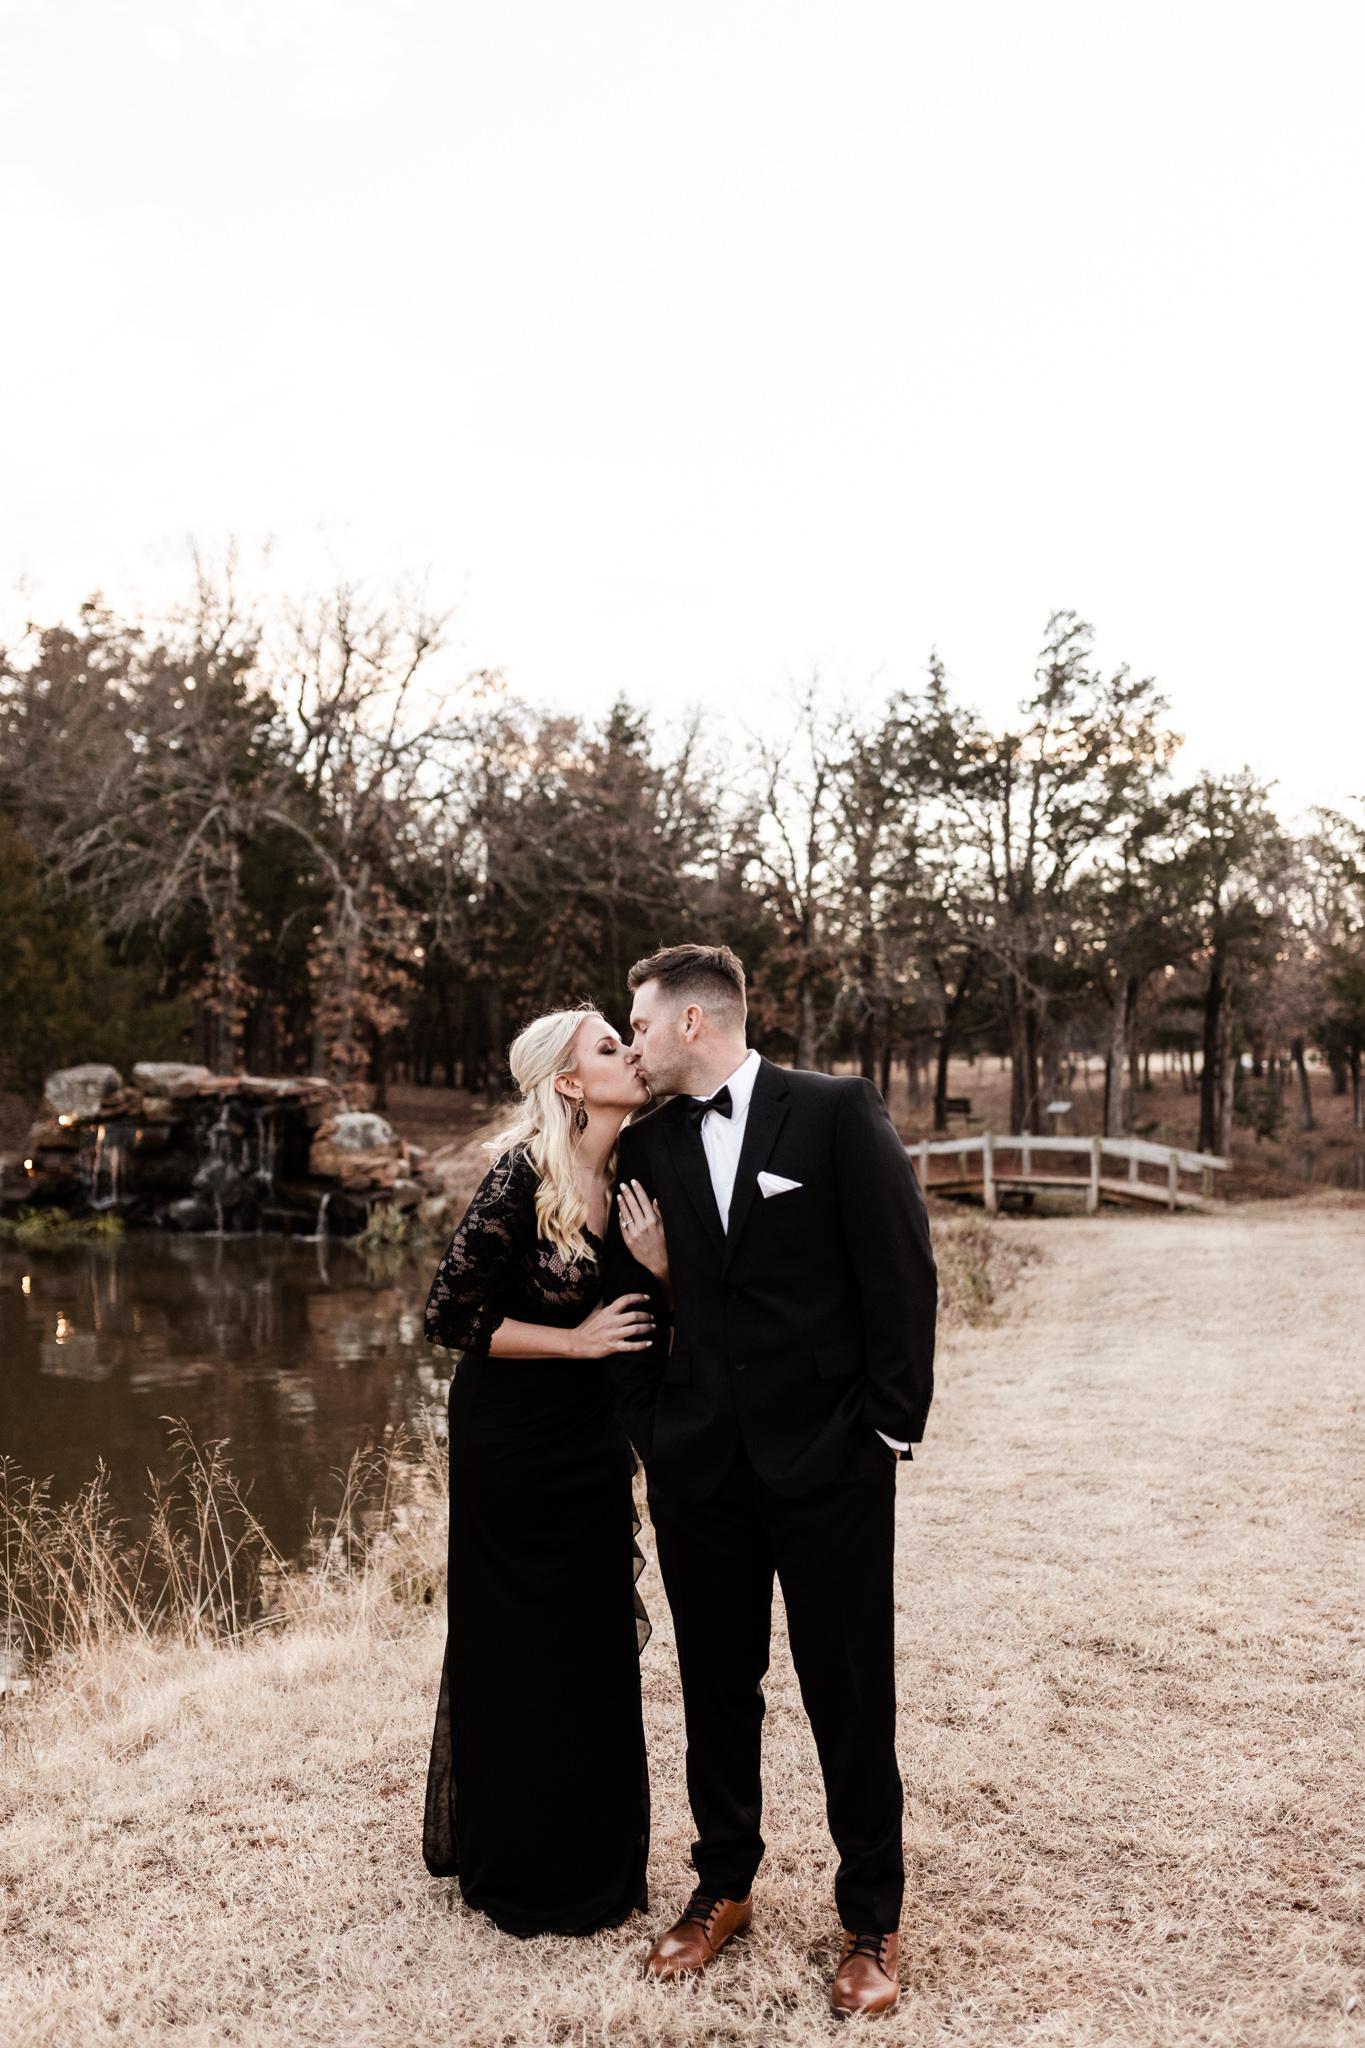 Wade + Stephanie | Warm Open Field Engagements | Oklahoma Wedding Photographer-49.jpg